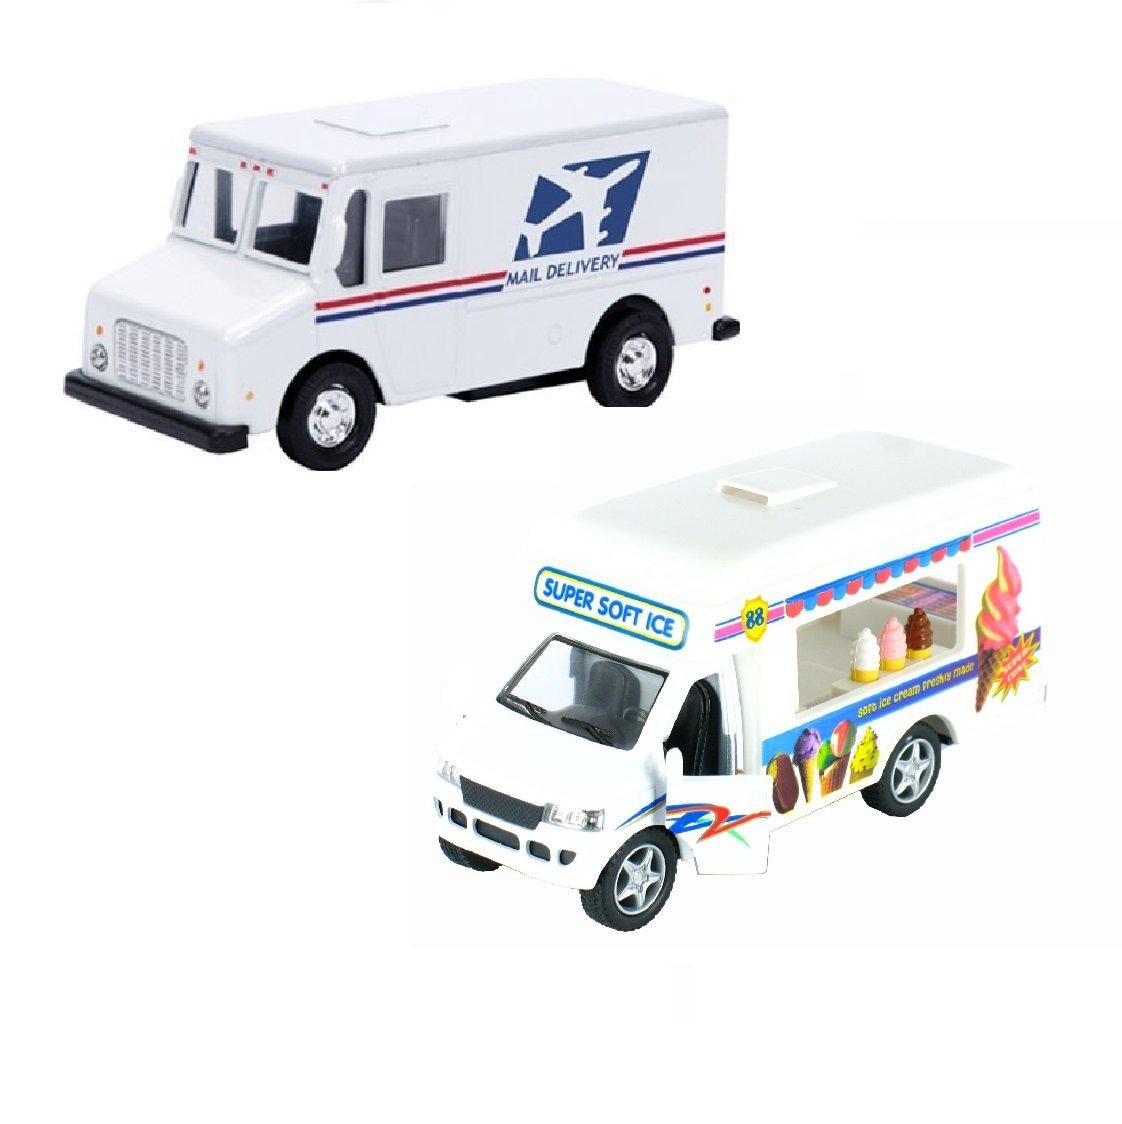 Postal Service Kid's Toy Truck (2 Trucks(USPS-Ice Cream))